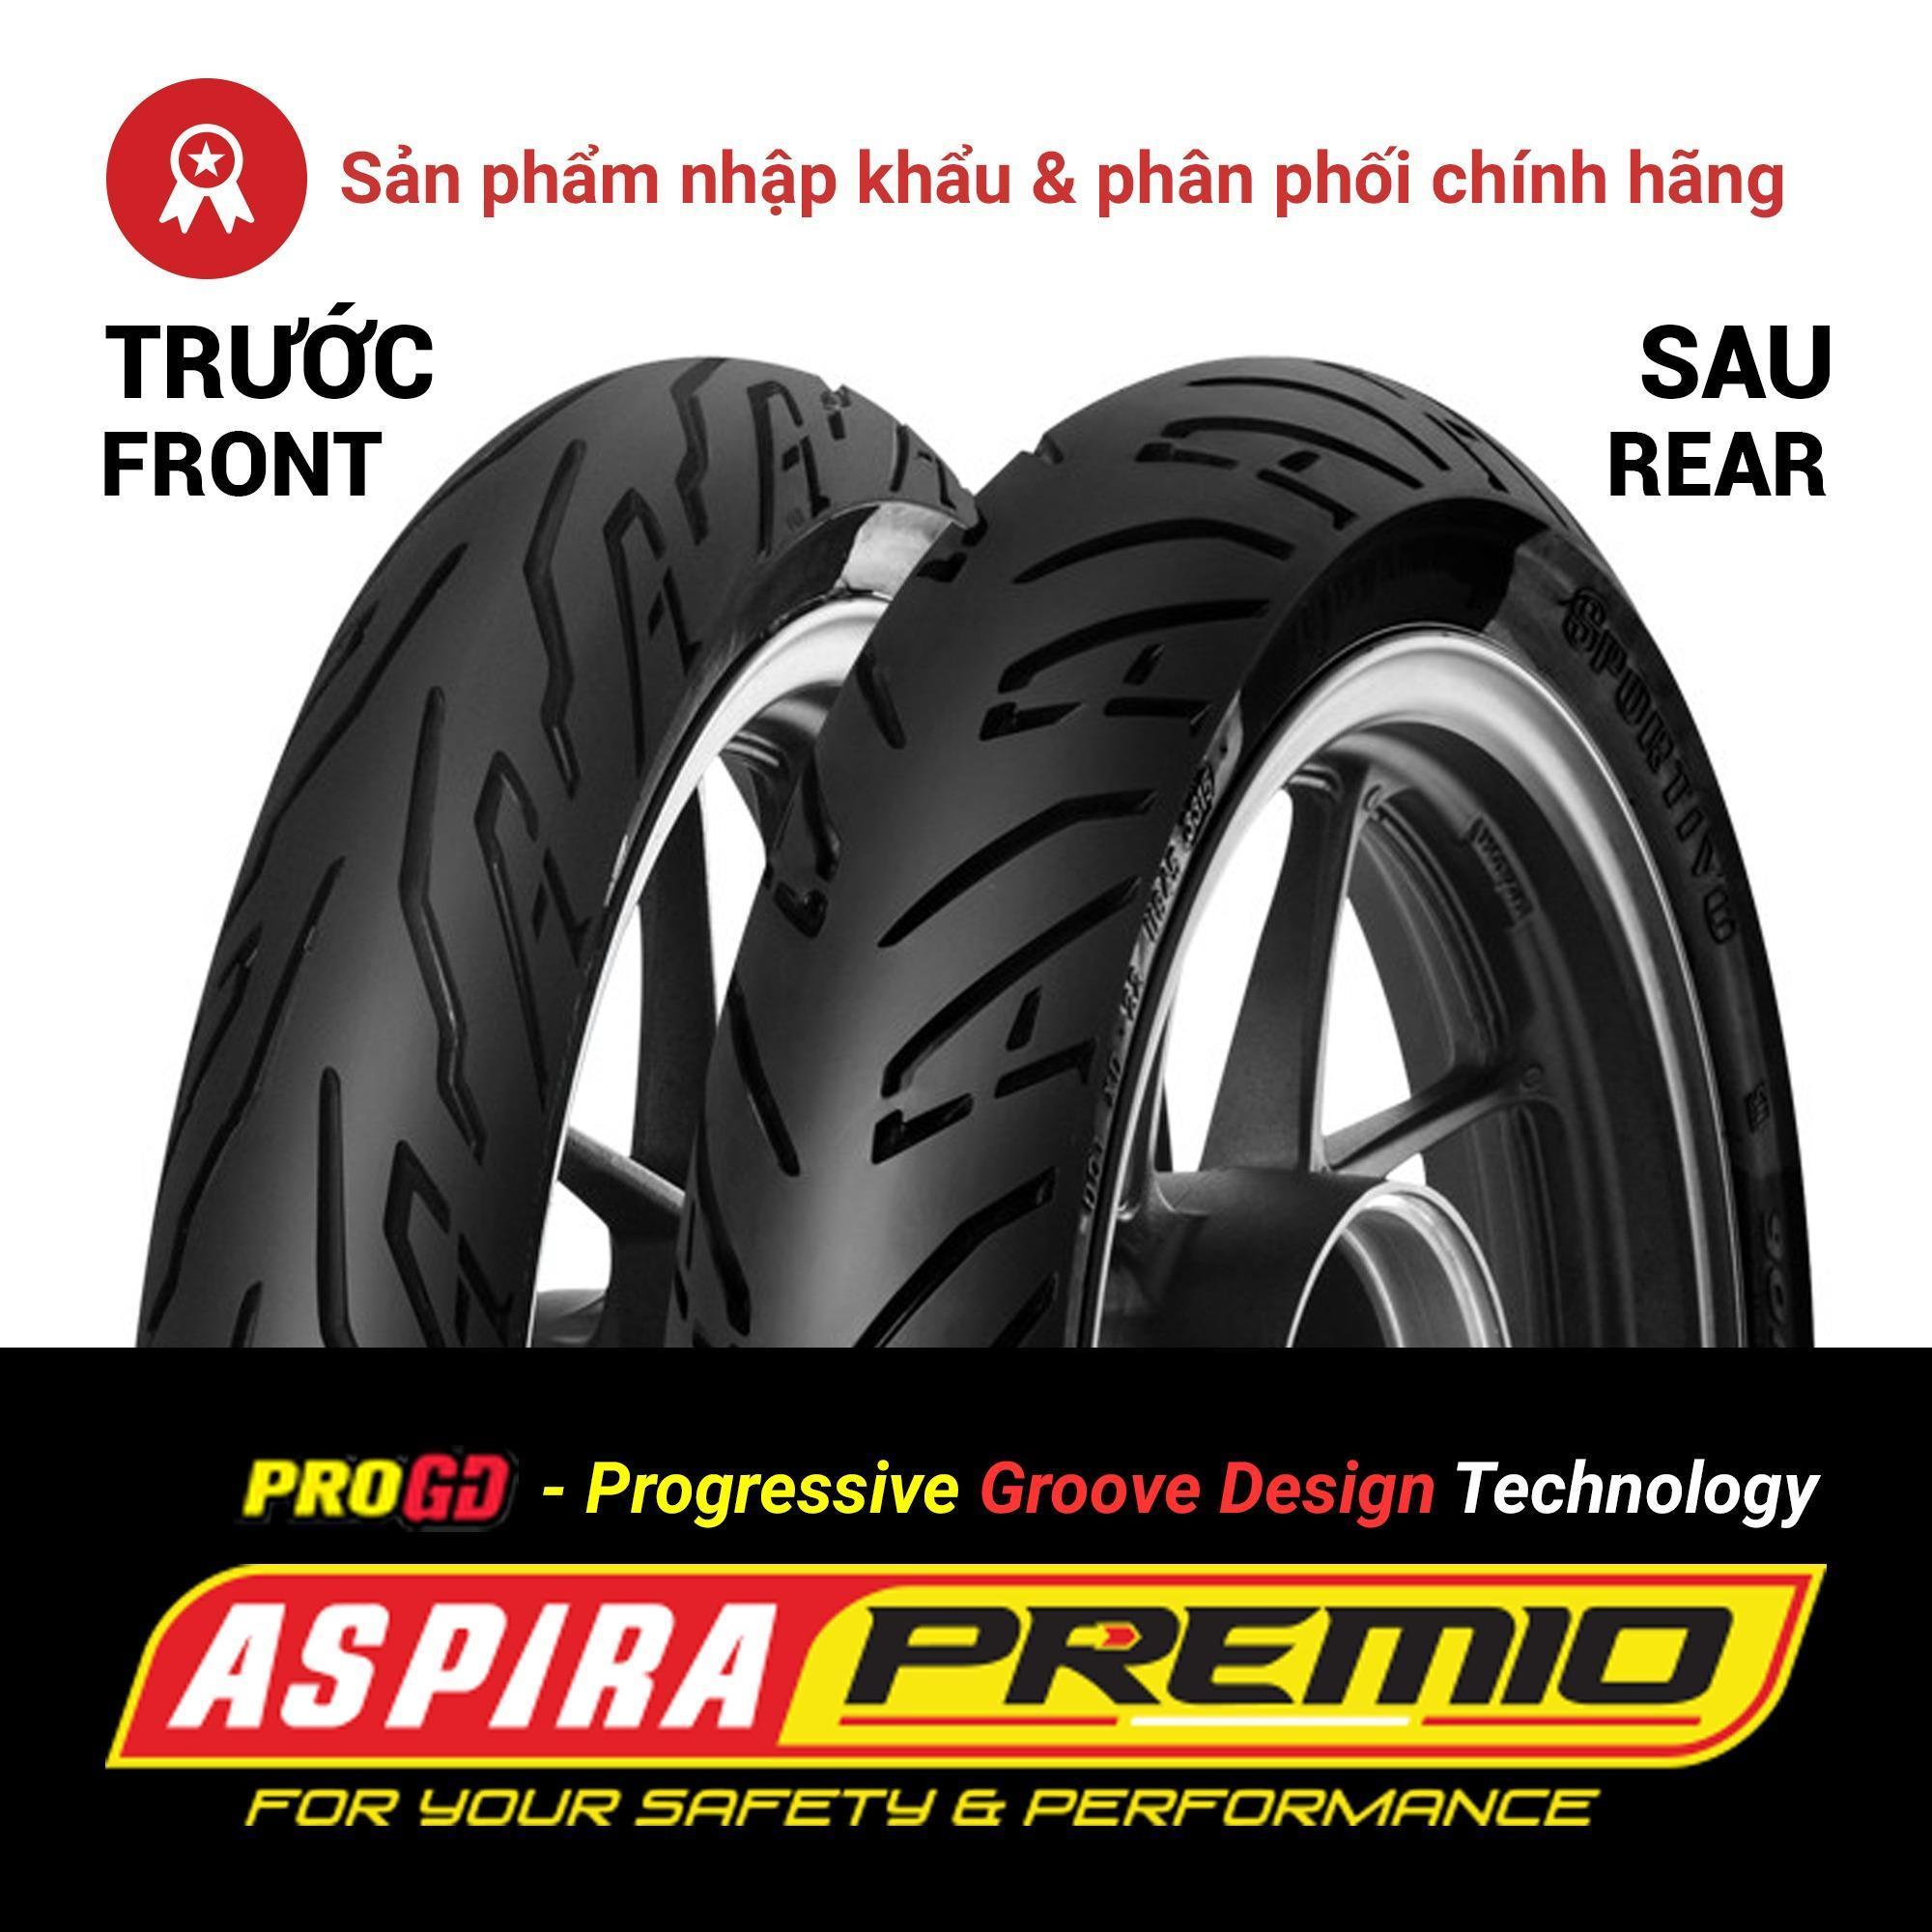 Thay lốp (vỏ) sau 160/60-17 Aspira Premio Sportivo cho xe côn tay phân khối lớn (PKL) Ducati Monster696 Nhật Bản